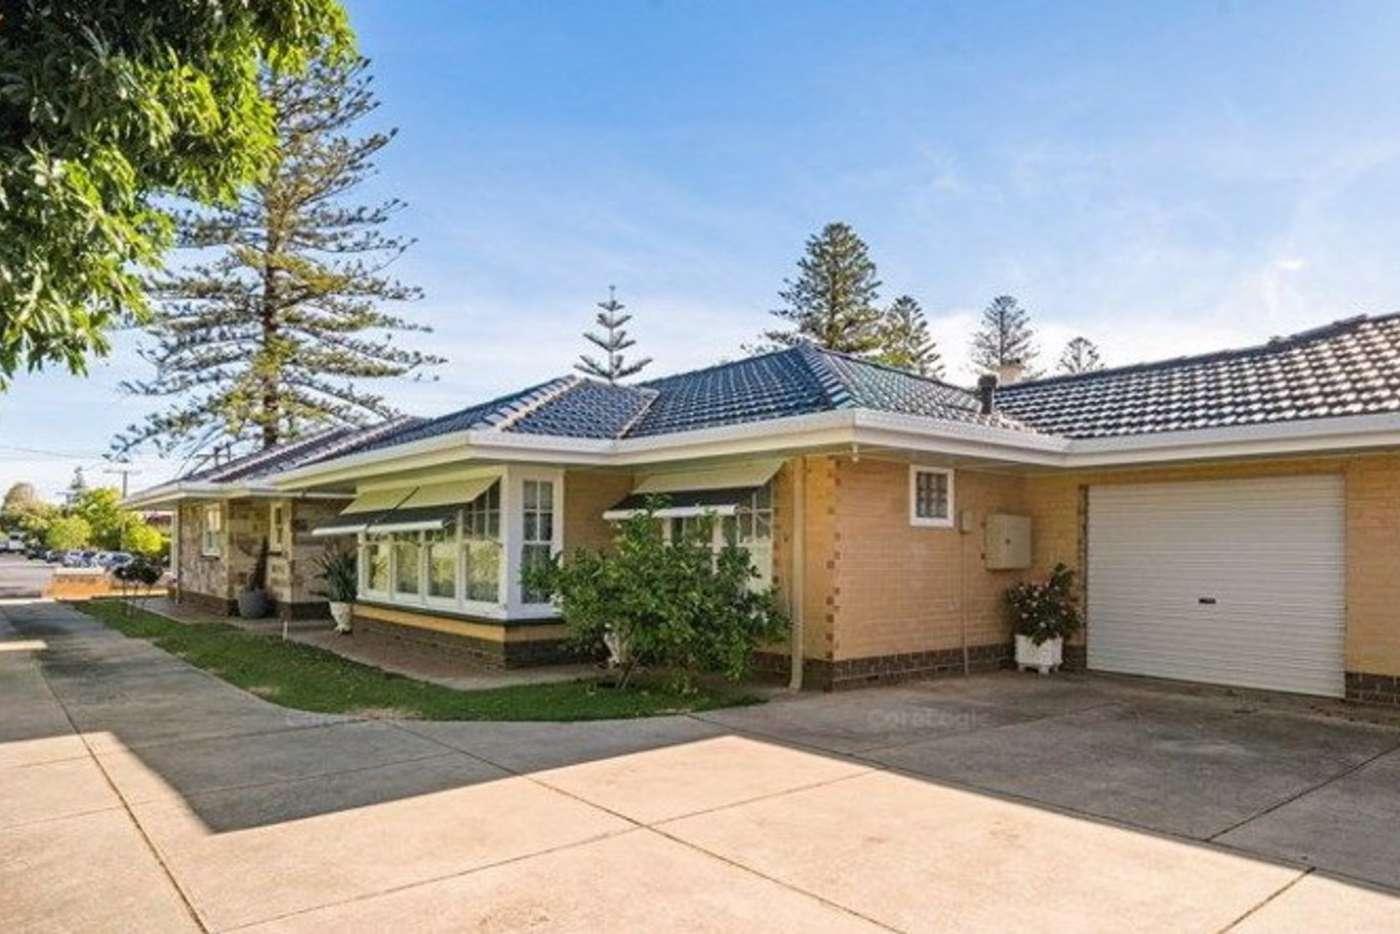 Main view of Homely unit listing, 2/21 Pier Street, Glenelg SA 5045